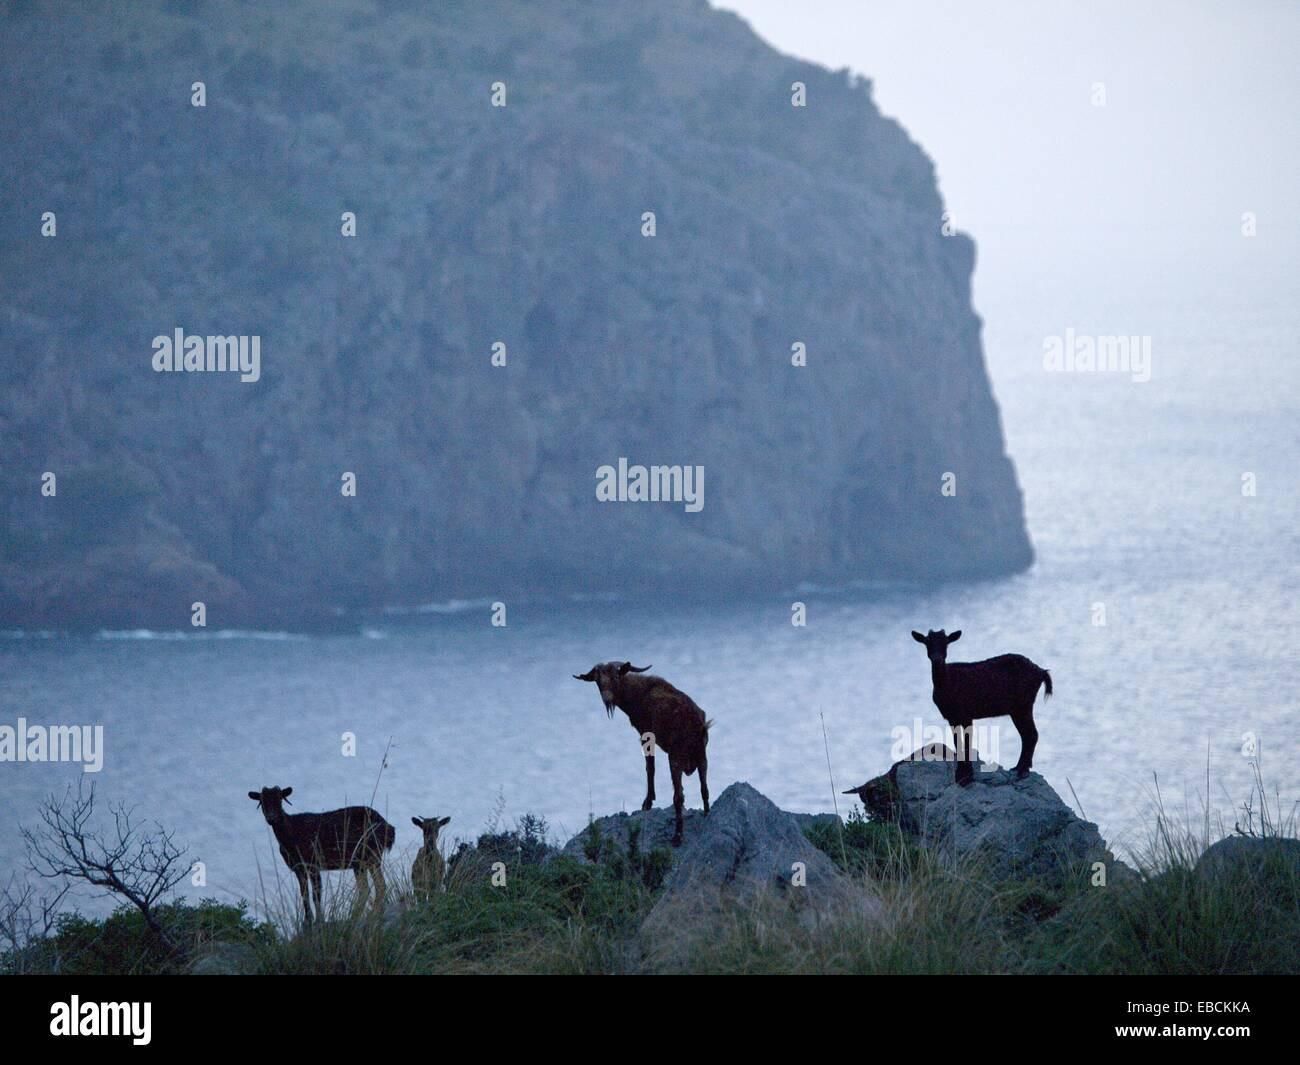 Maroon goats against the nose of Cala Rotja, Escorca, Sierra de Tramuntana, Balearic Islands, Spain, Europe - Stock Image